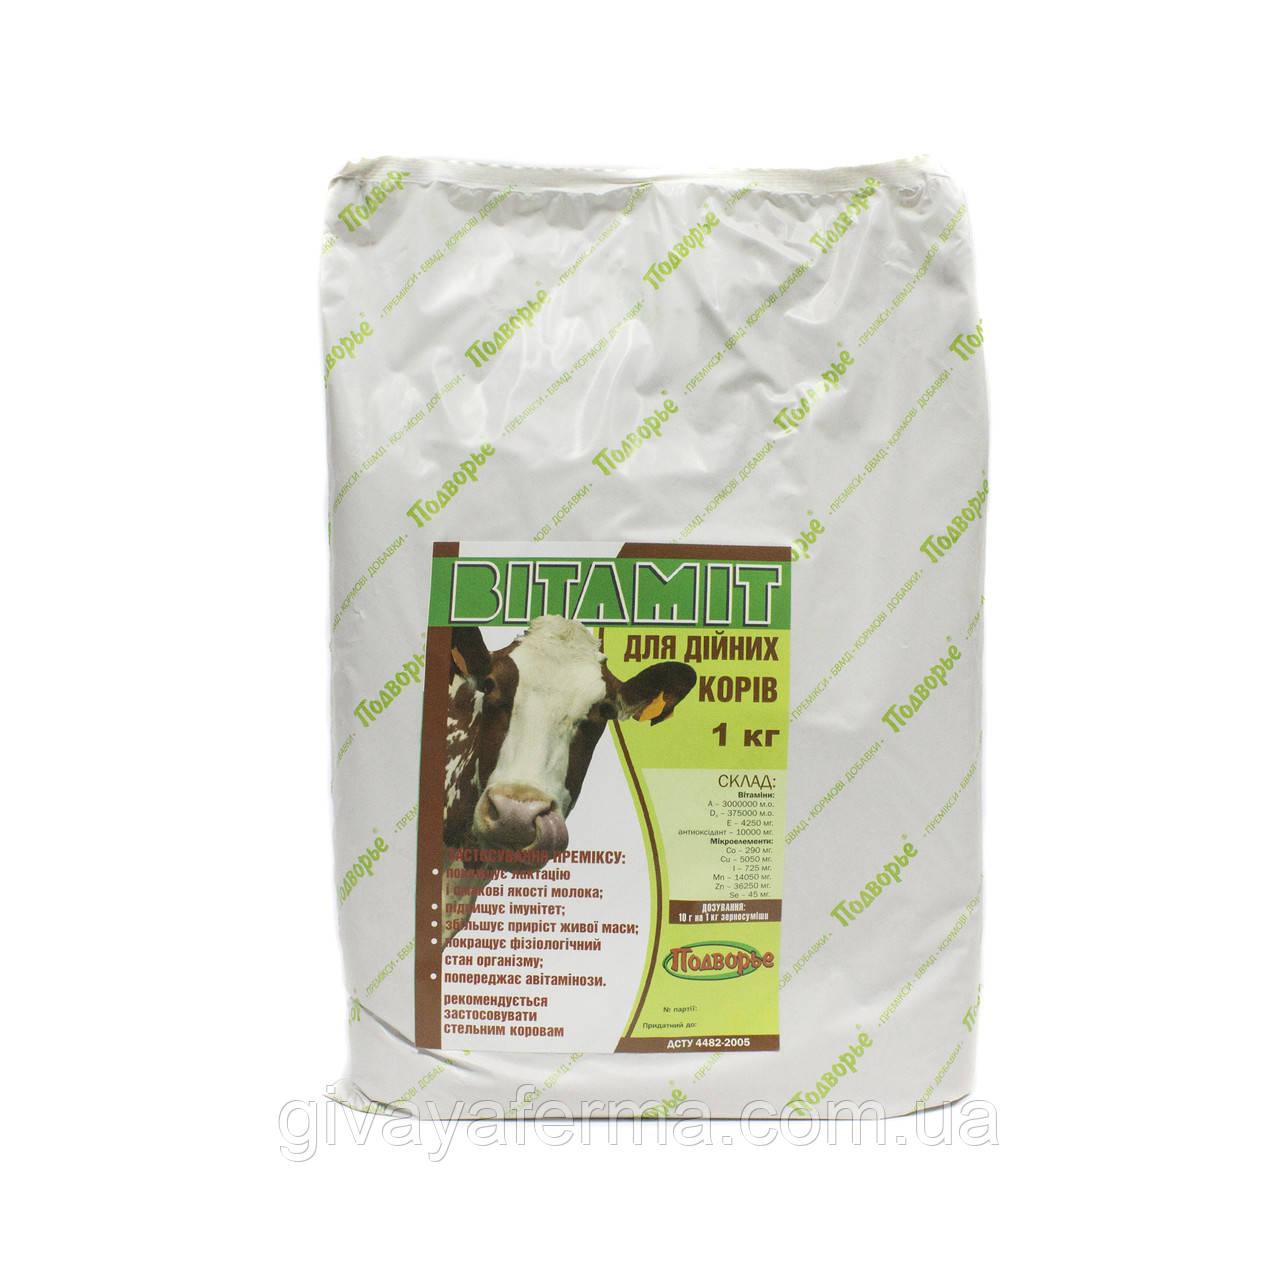 Премикс Витамит - дойная корова 1%, 1 кг, витаминная добавка в корм